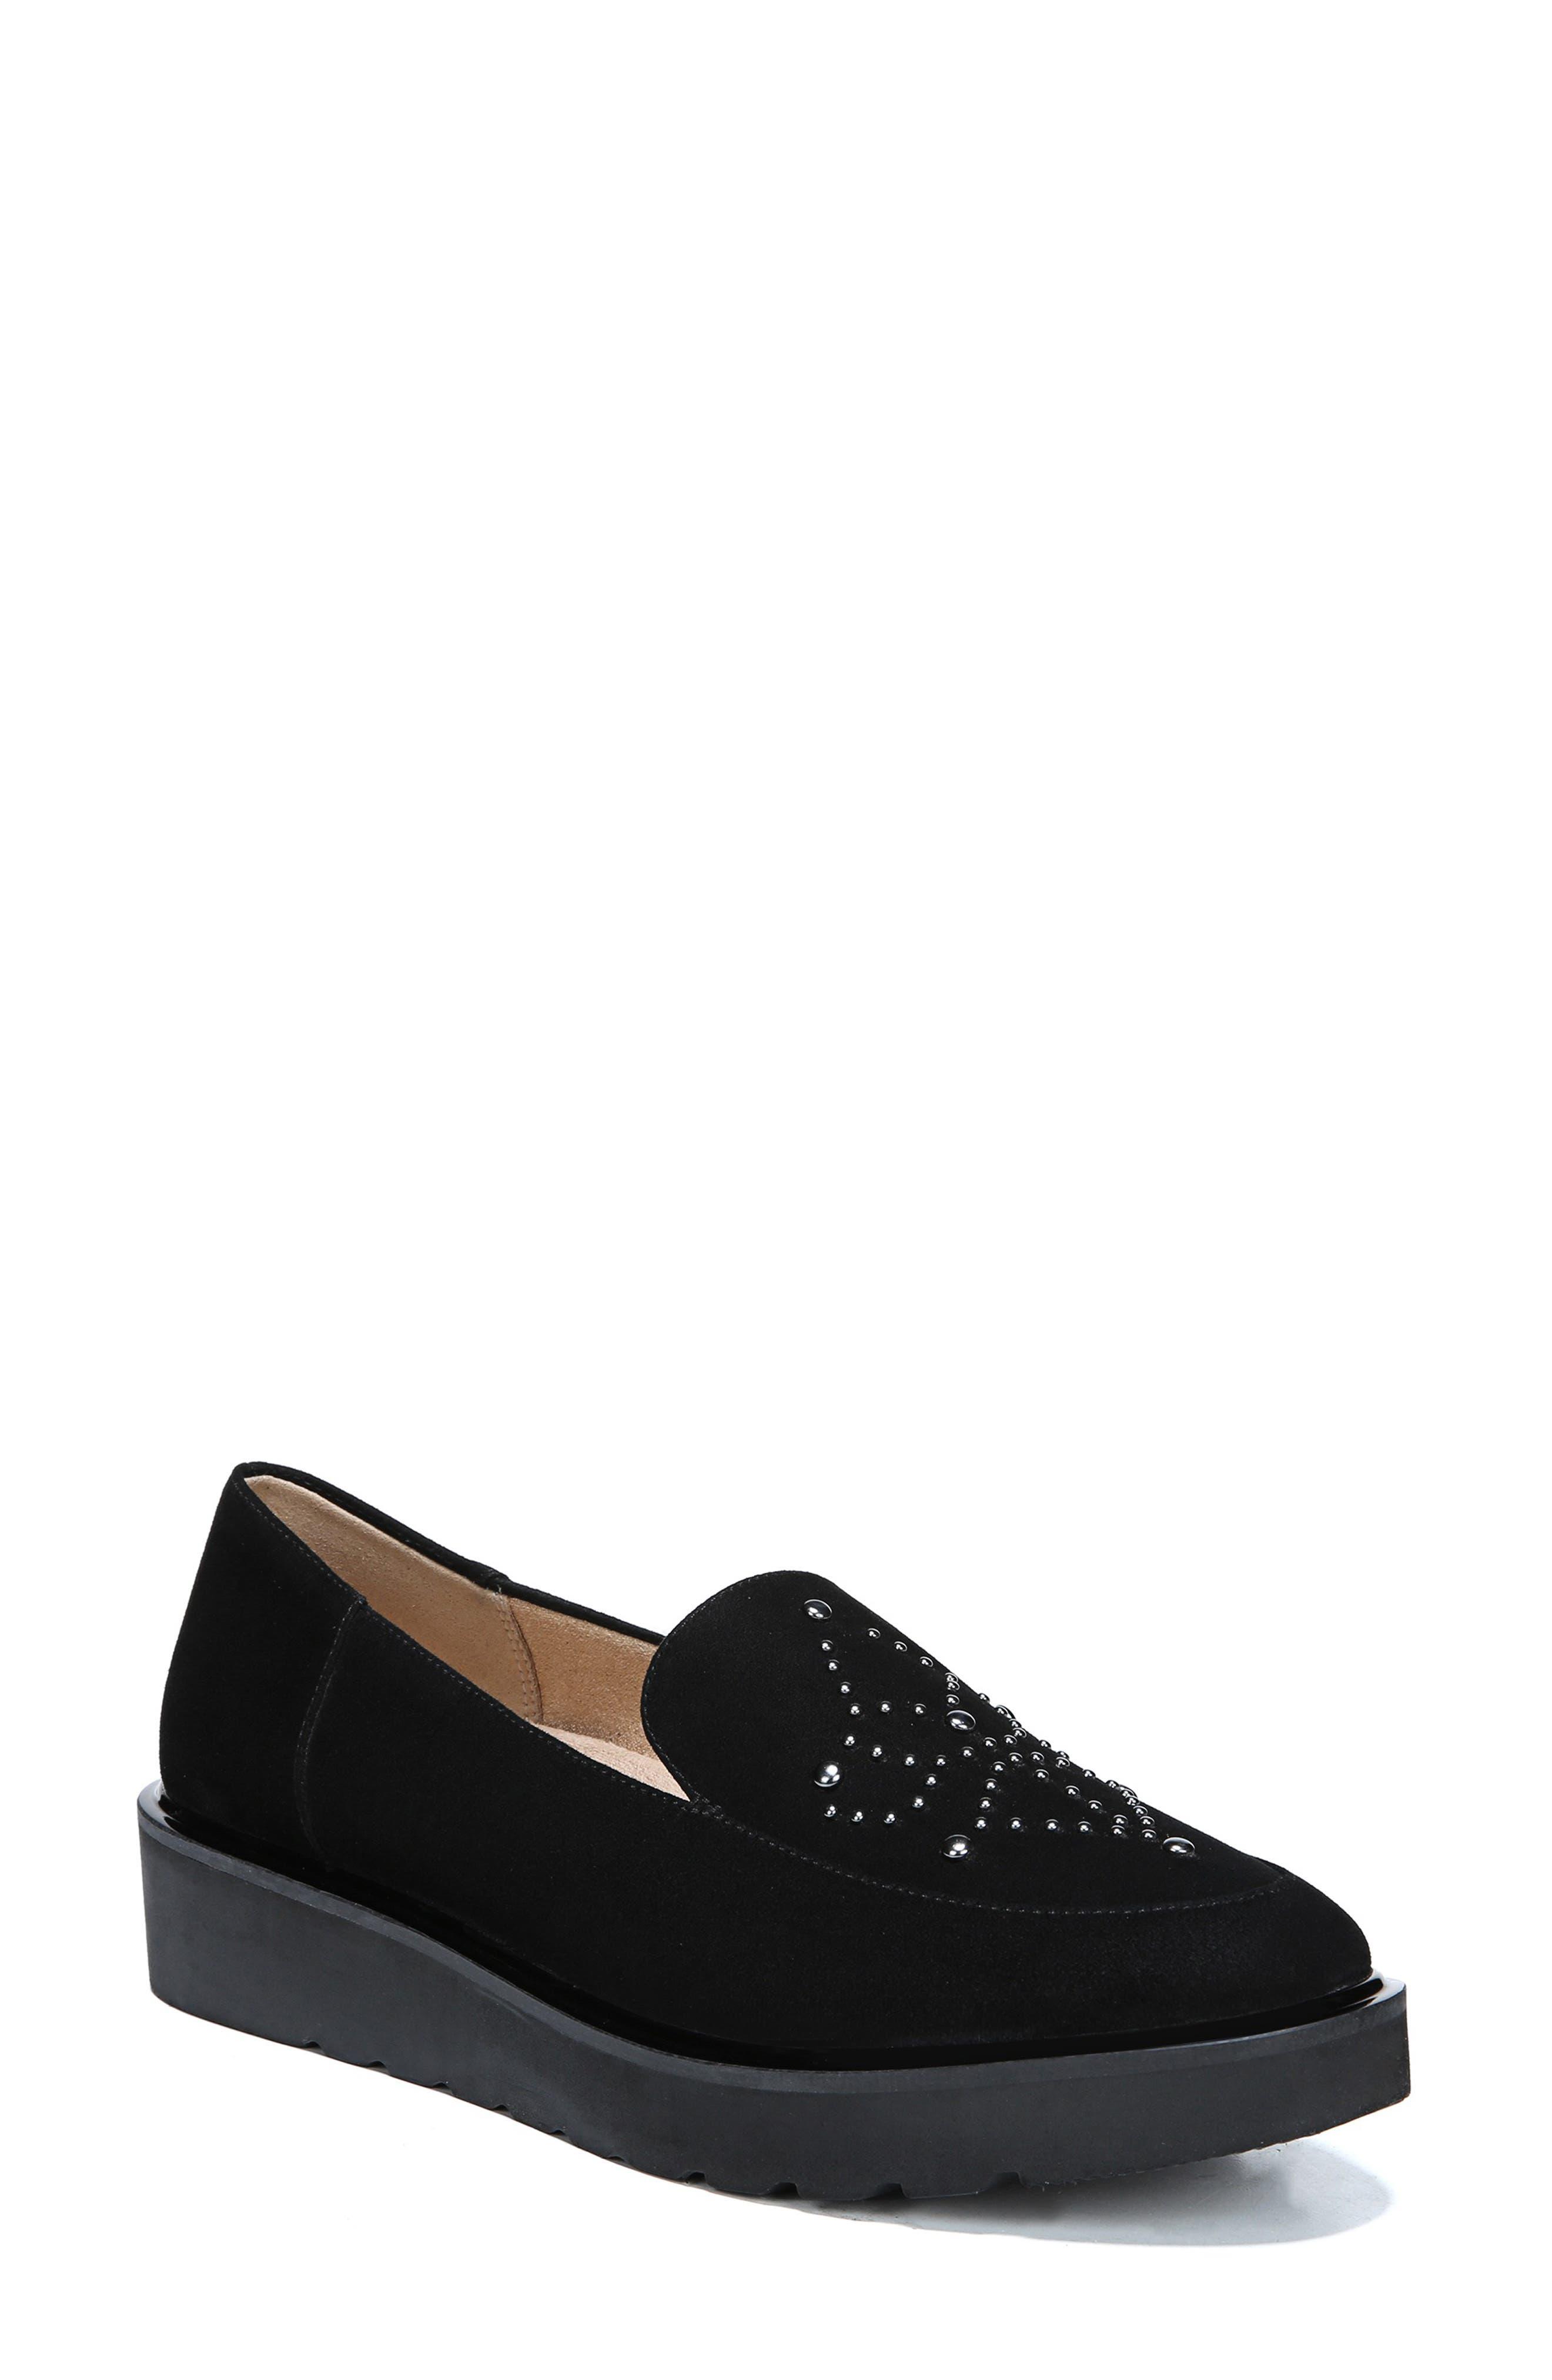 Andie Loafer,                         Main,                         color, BLACK SUEDE